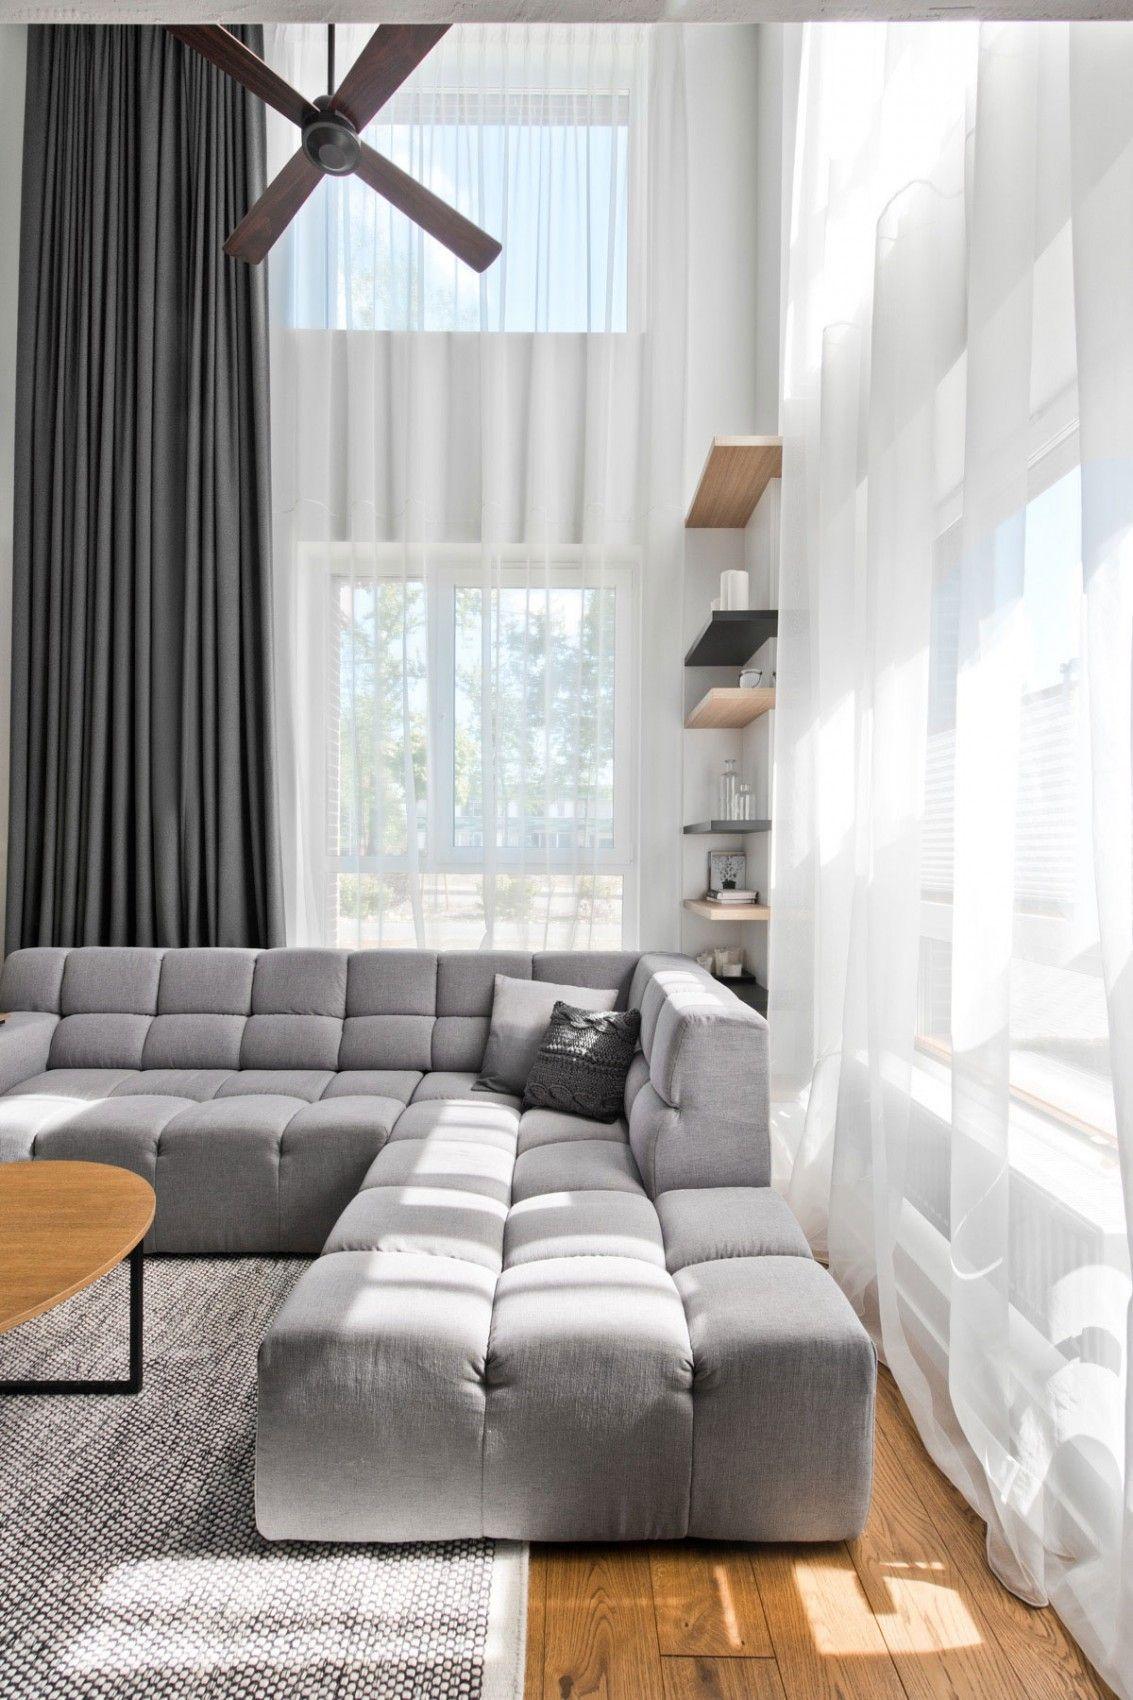 Architecture Beast: Scandinavian interior design in a beautiful small apartment | #apartment #interior #design #scandinavian #livingroom